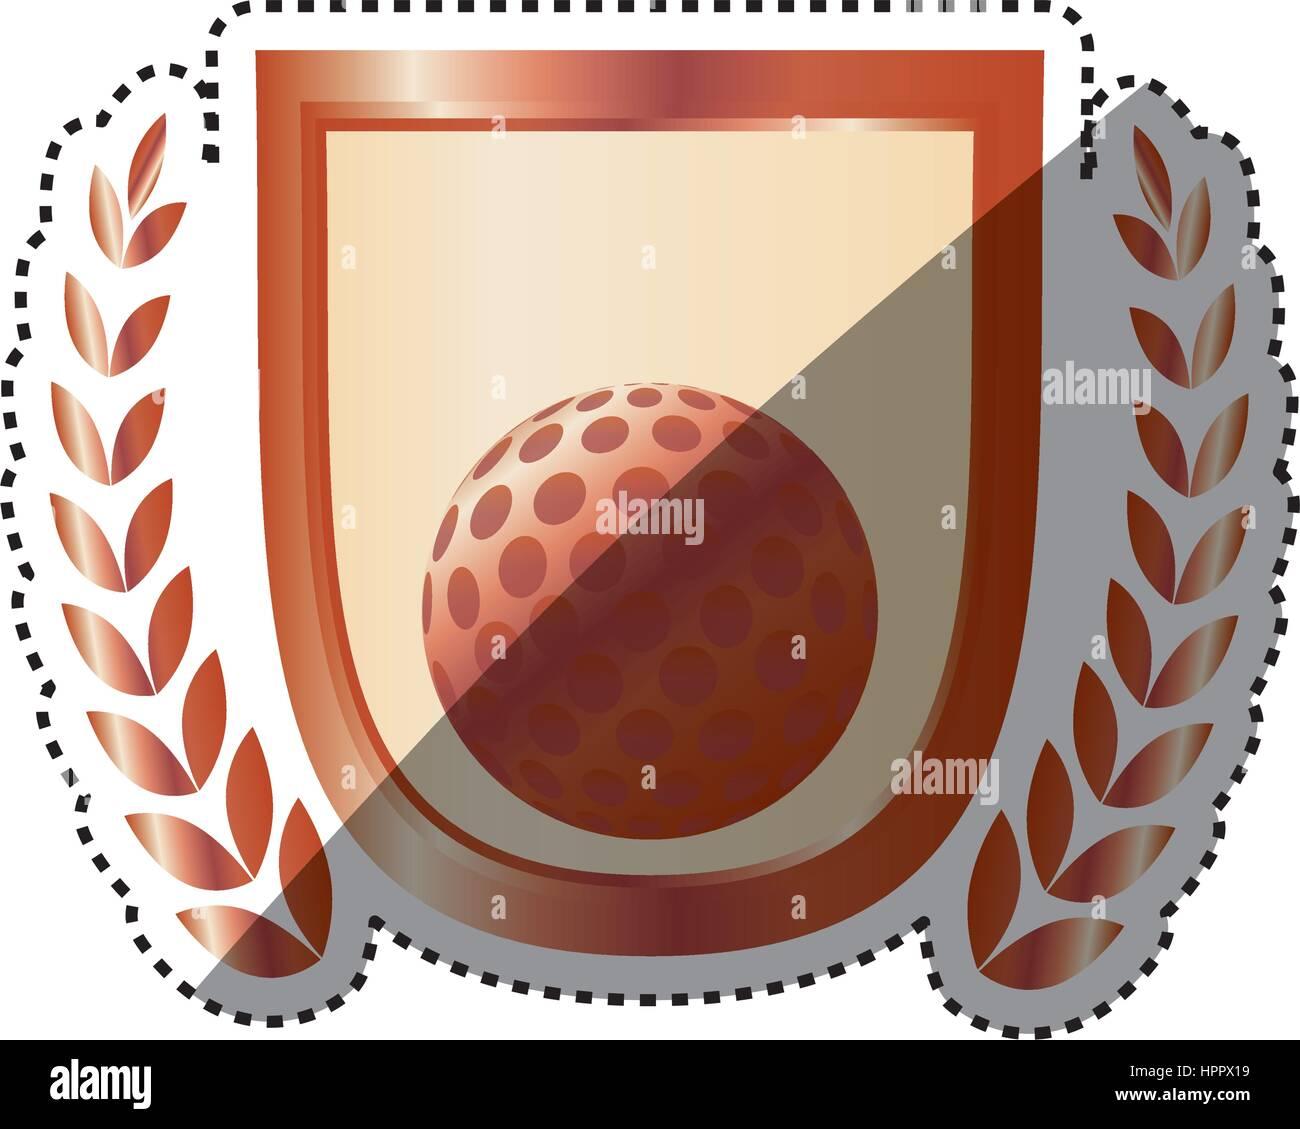 Wreath Shield Stockfotos & Wreath Shield Bilder - Alamy